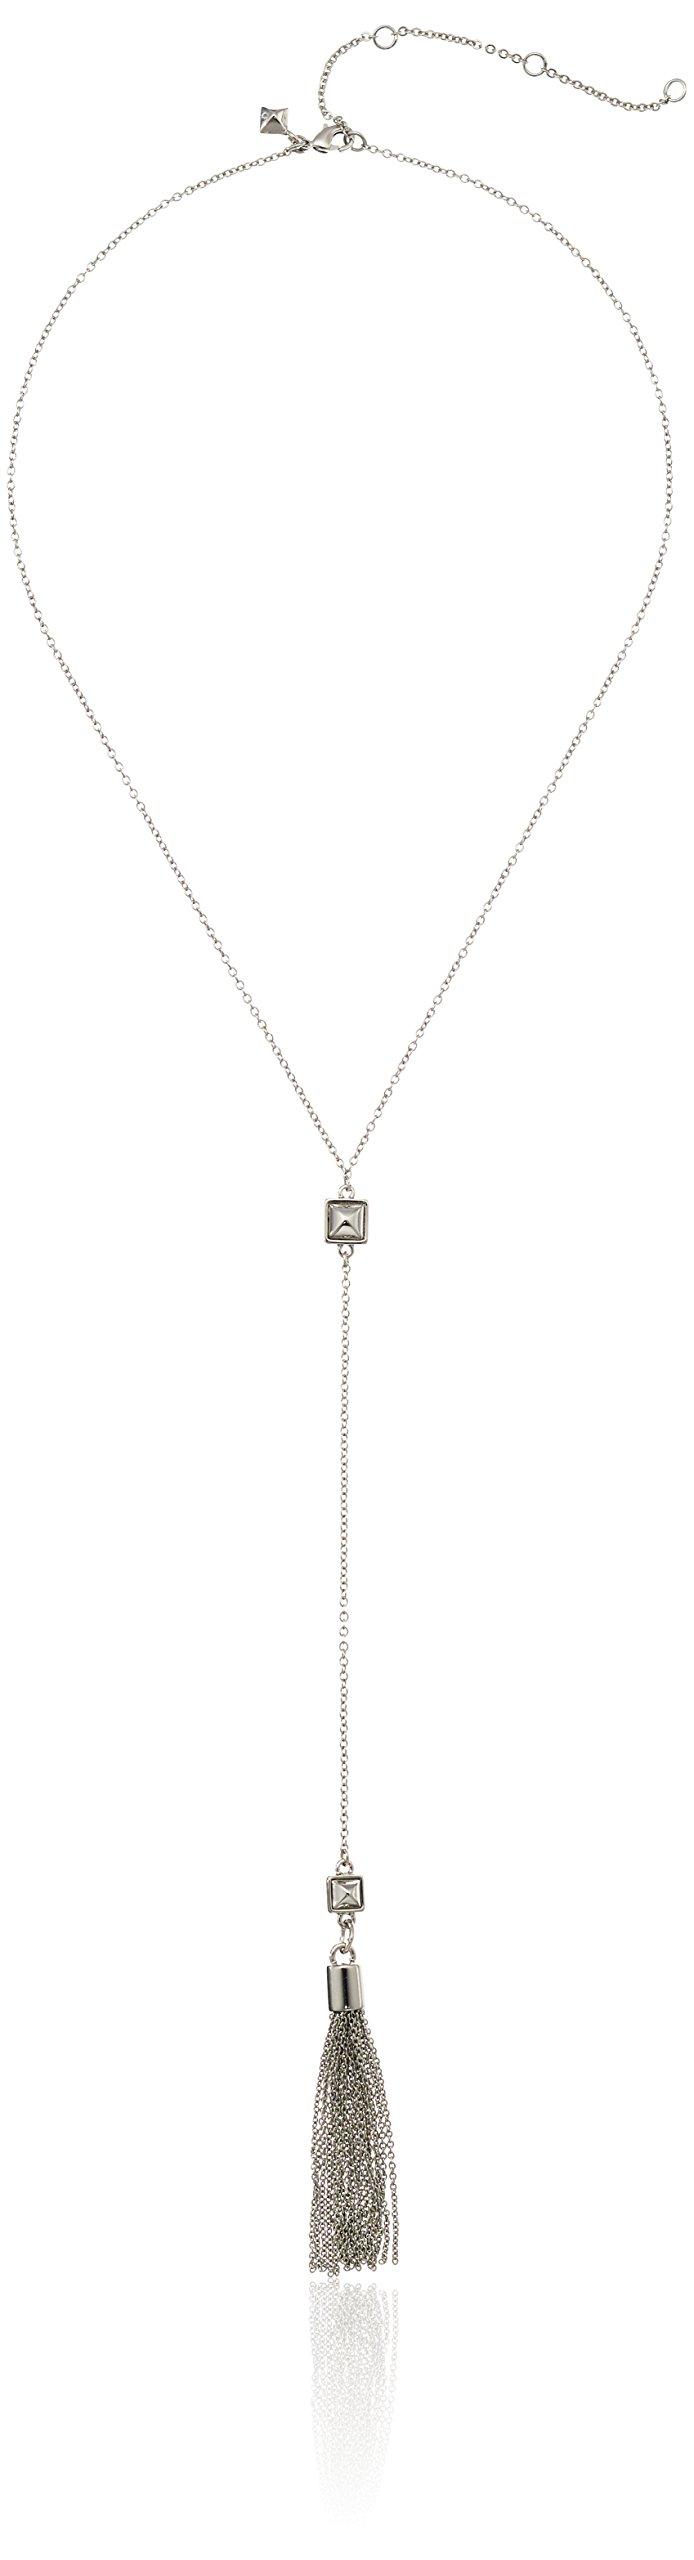 Rebecca Minkoff Stud with Fringe Rhodium Y-Shaped Necklace